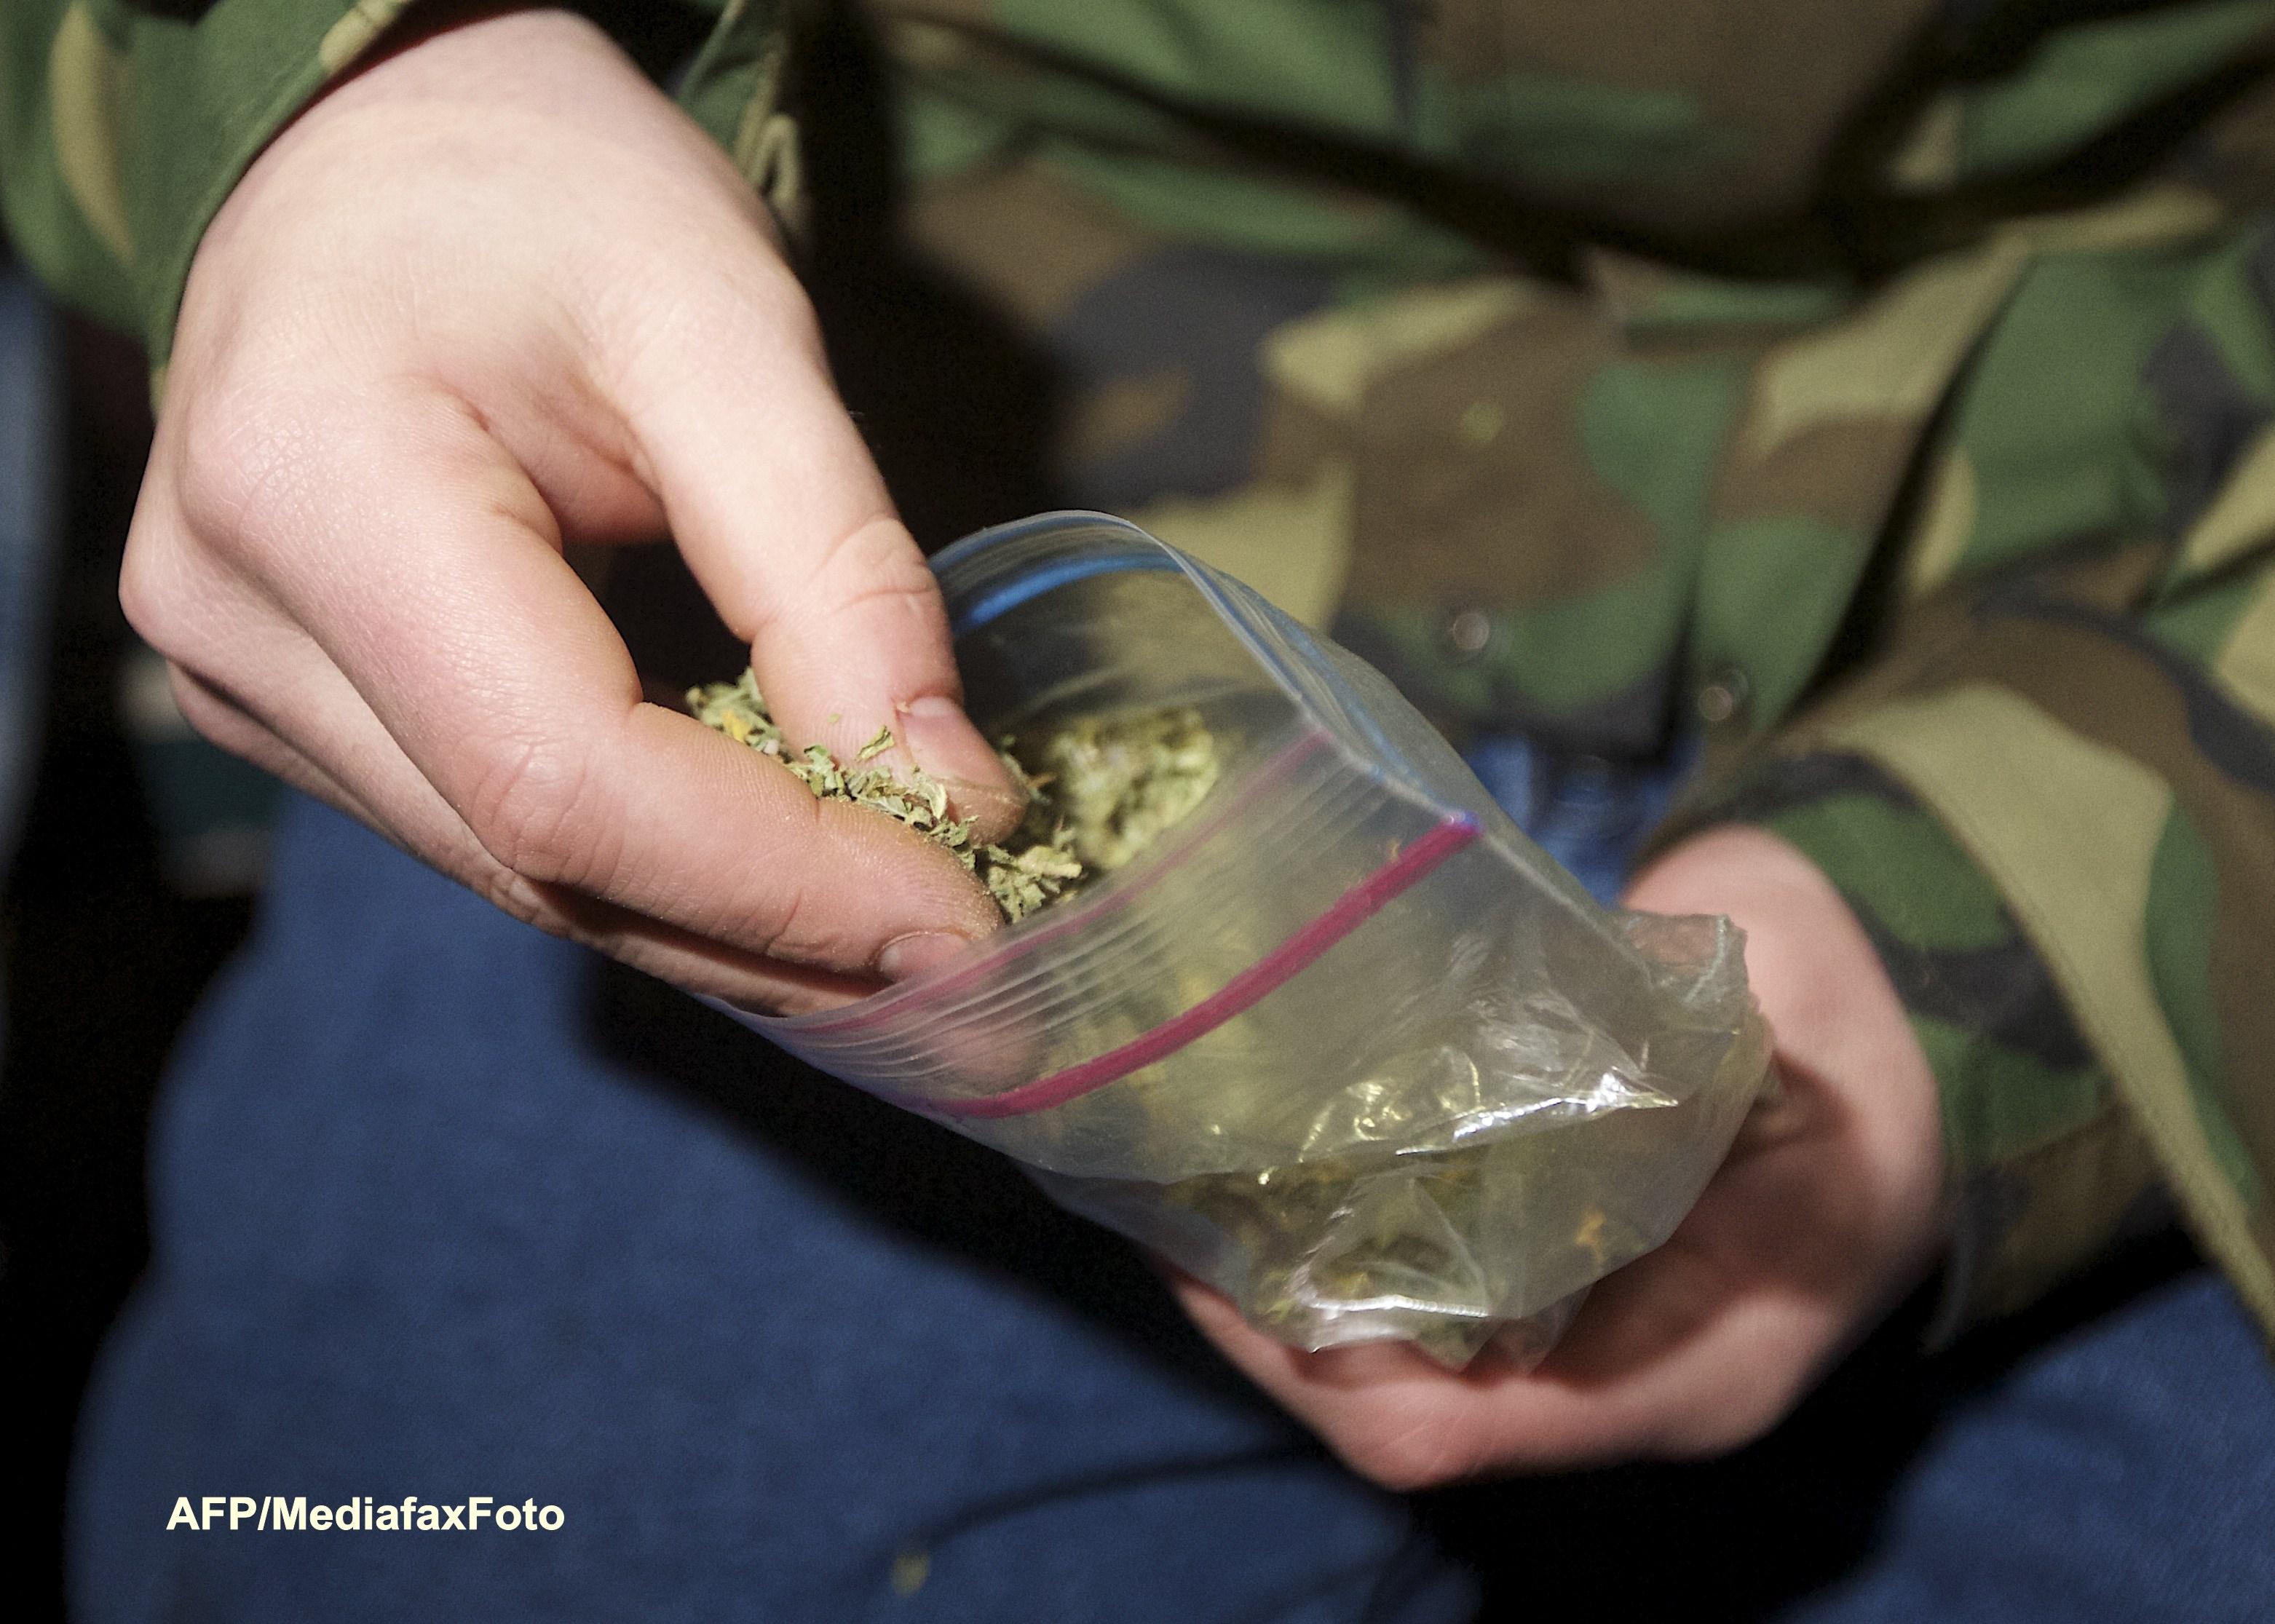 Breaking Bad, varianta reala. Cum a ajuns un cuplu de britanici sa produca tone de marijuana